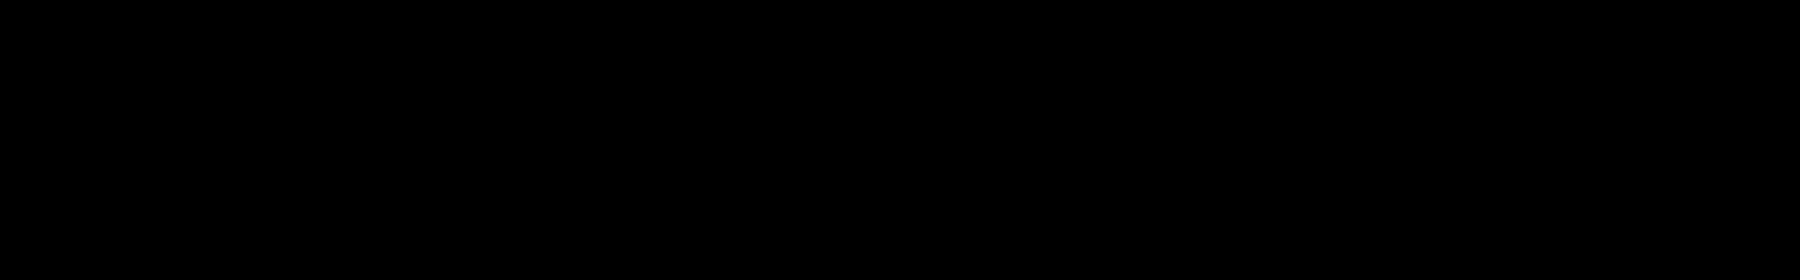 VELA audio waveform